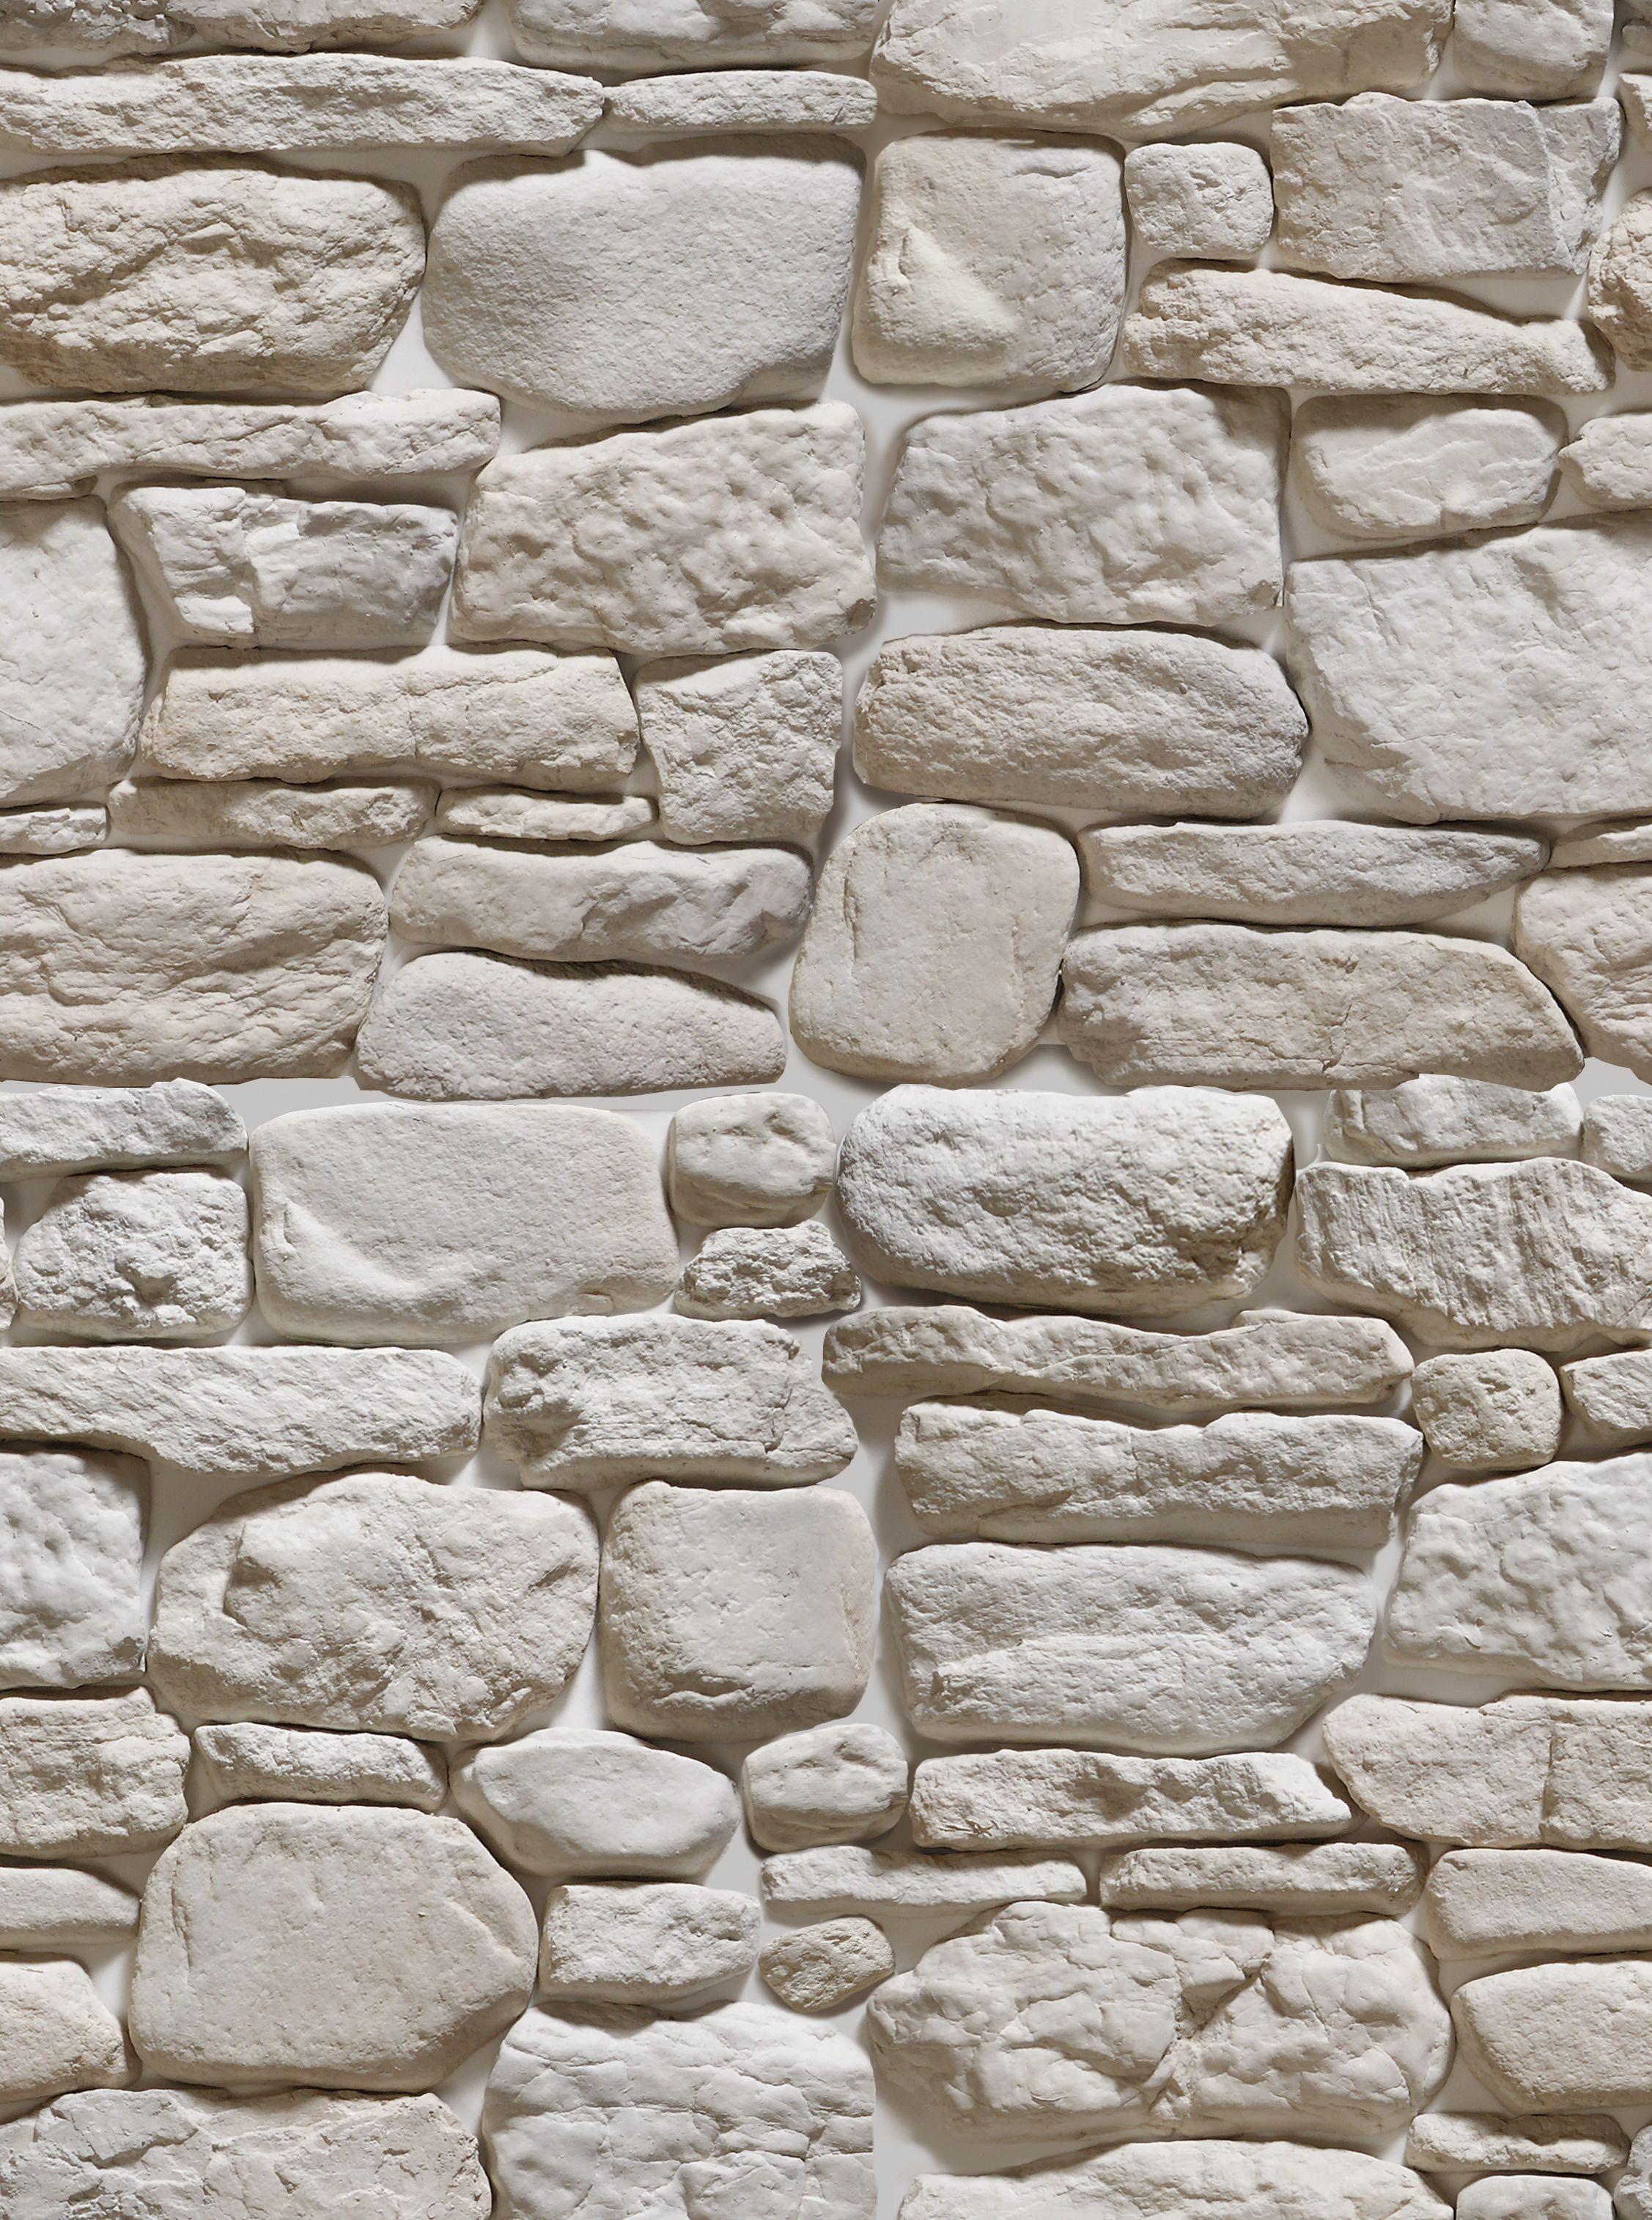 круглые stones, stone, wall, texture, речной stone, stone wall ...